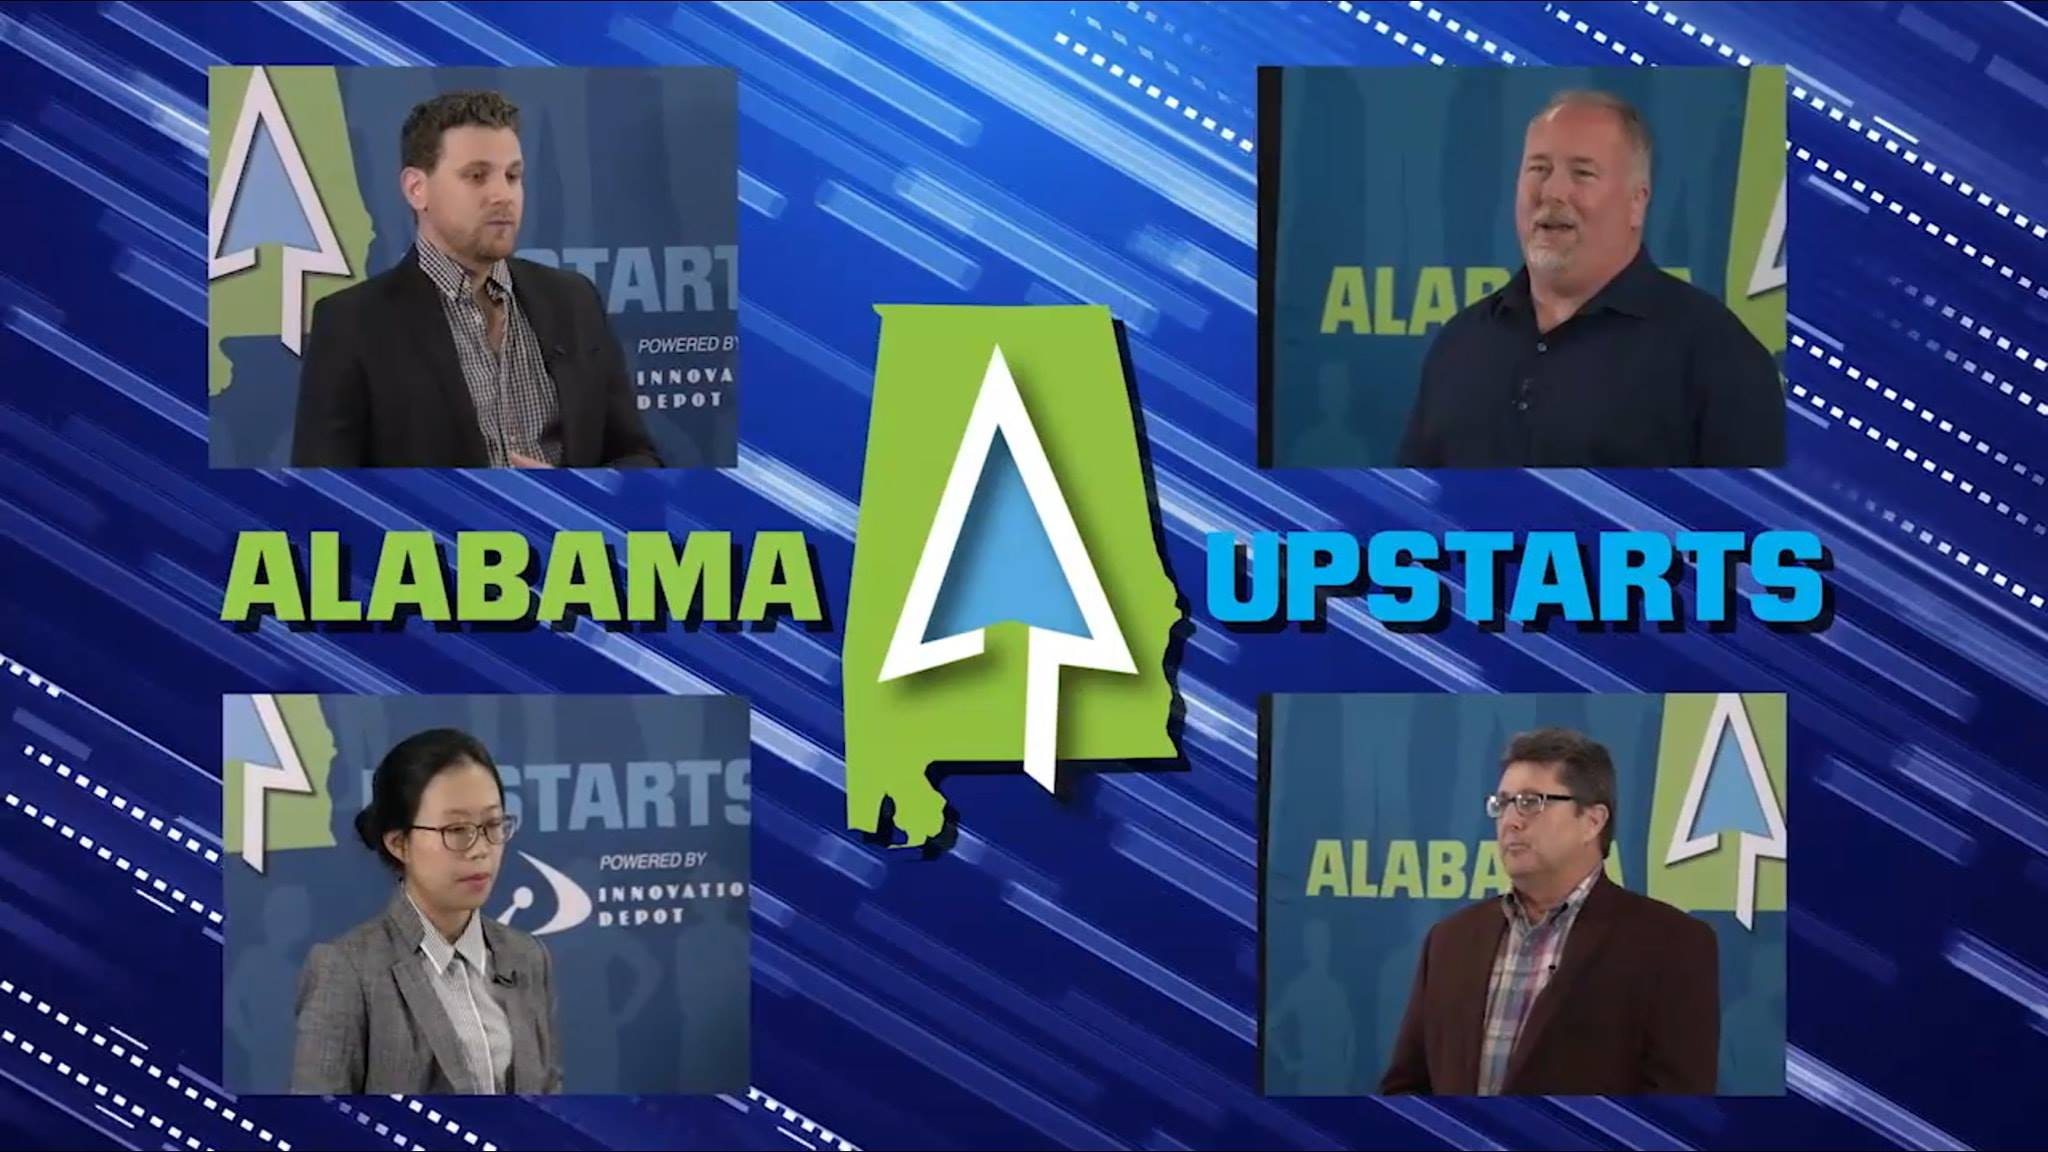 Alabama Upstarts.jpg